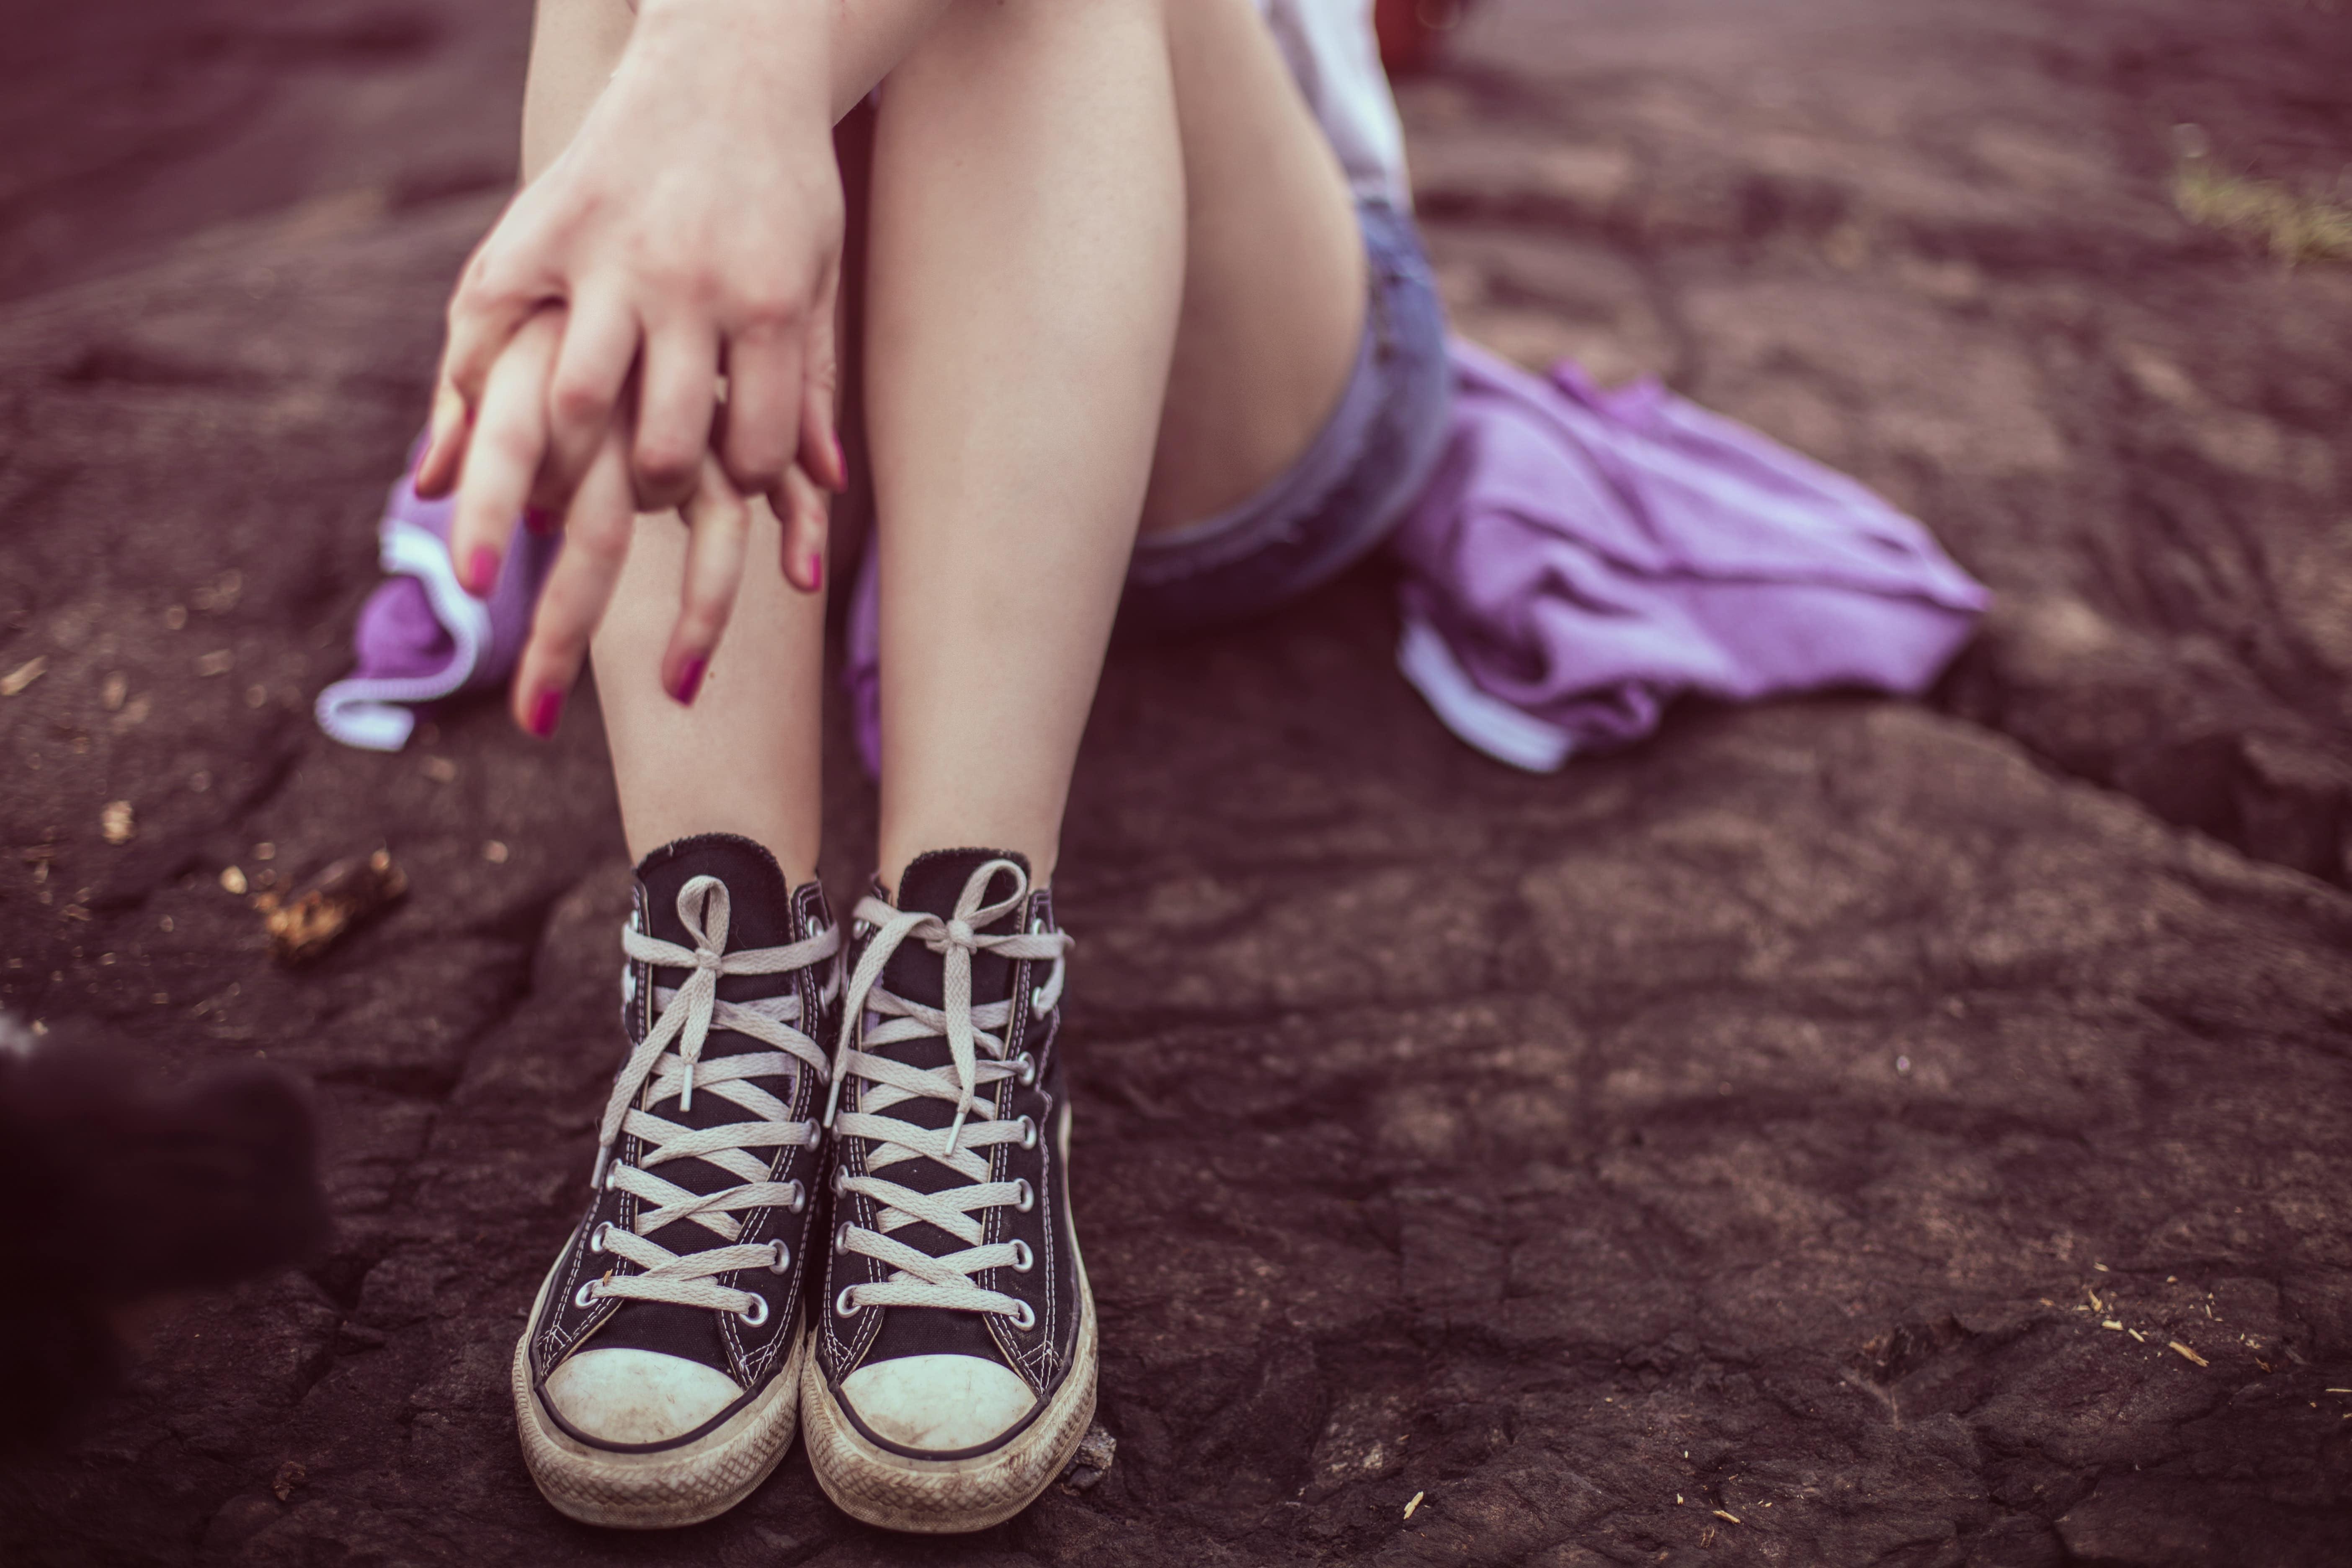 converse-all-star-fashion-foot-girl-1581